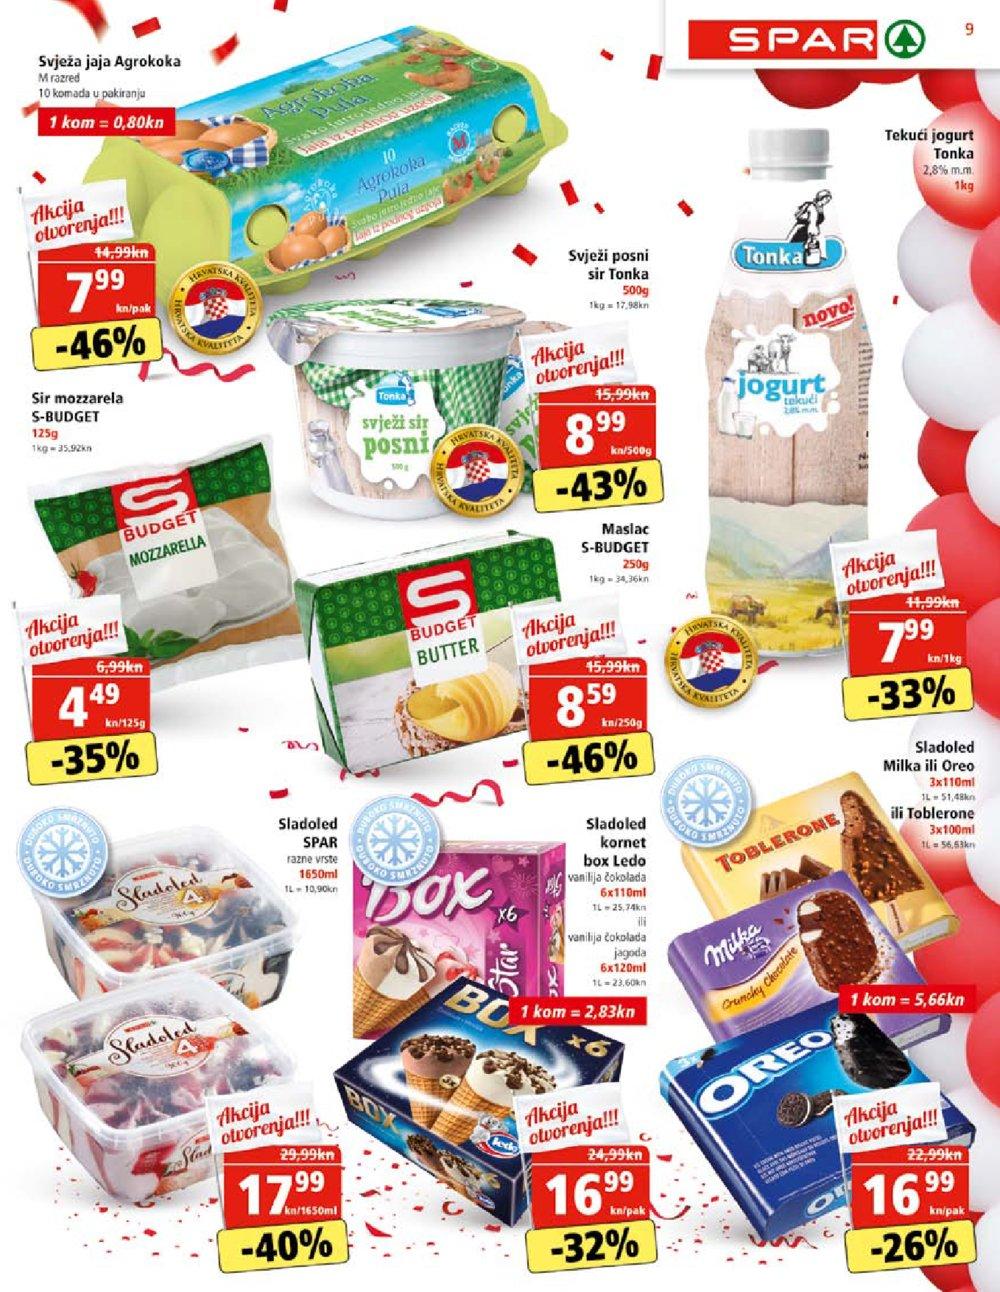 Spar katalog Otvorenje supermarketa Buje 23.07.-04.08.2020.